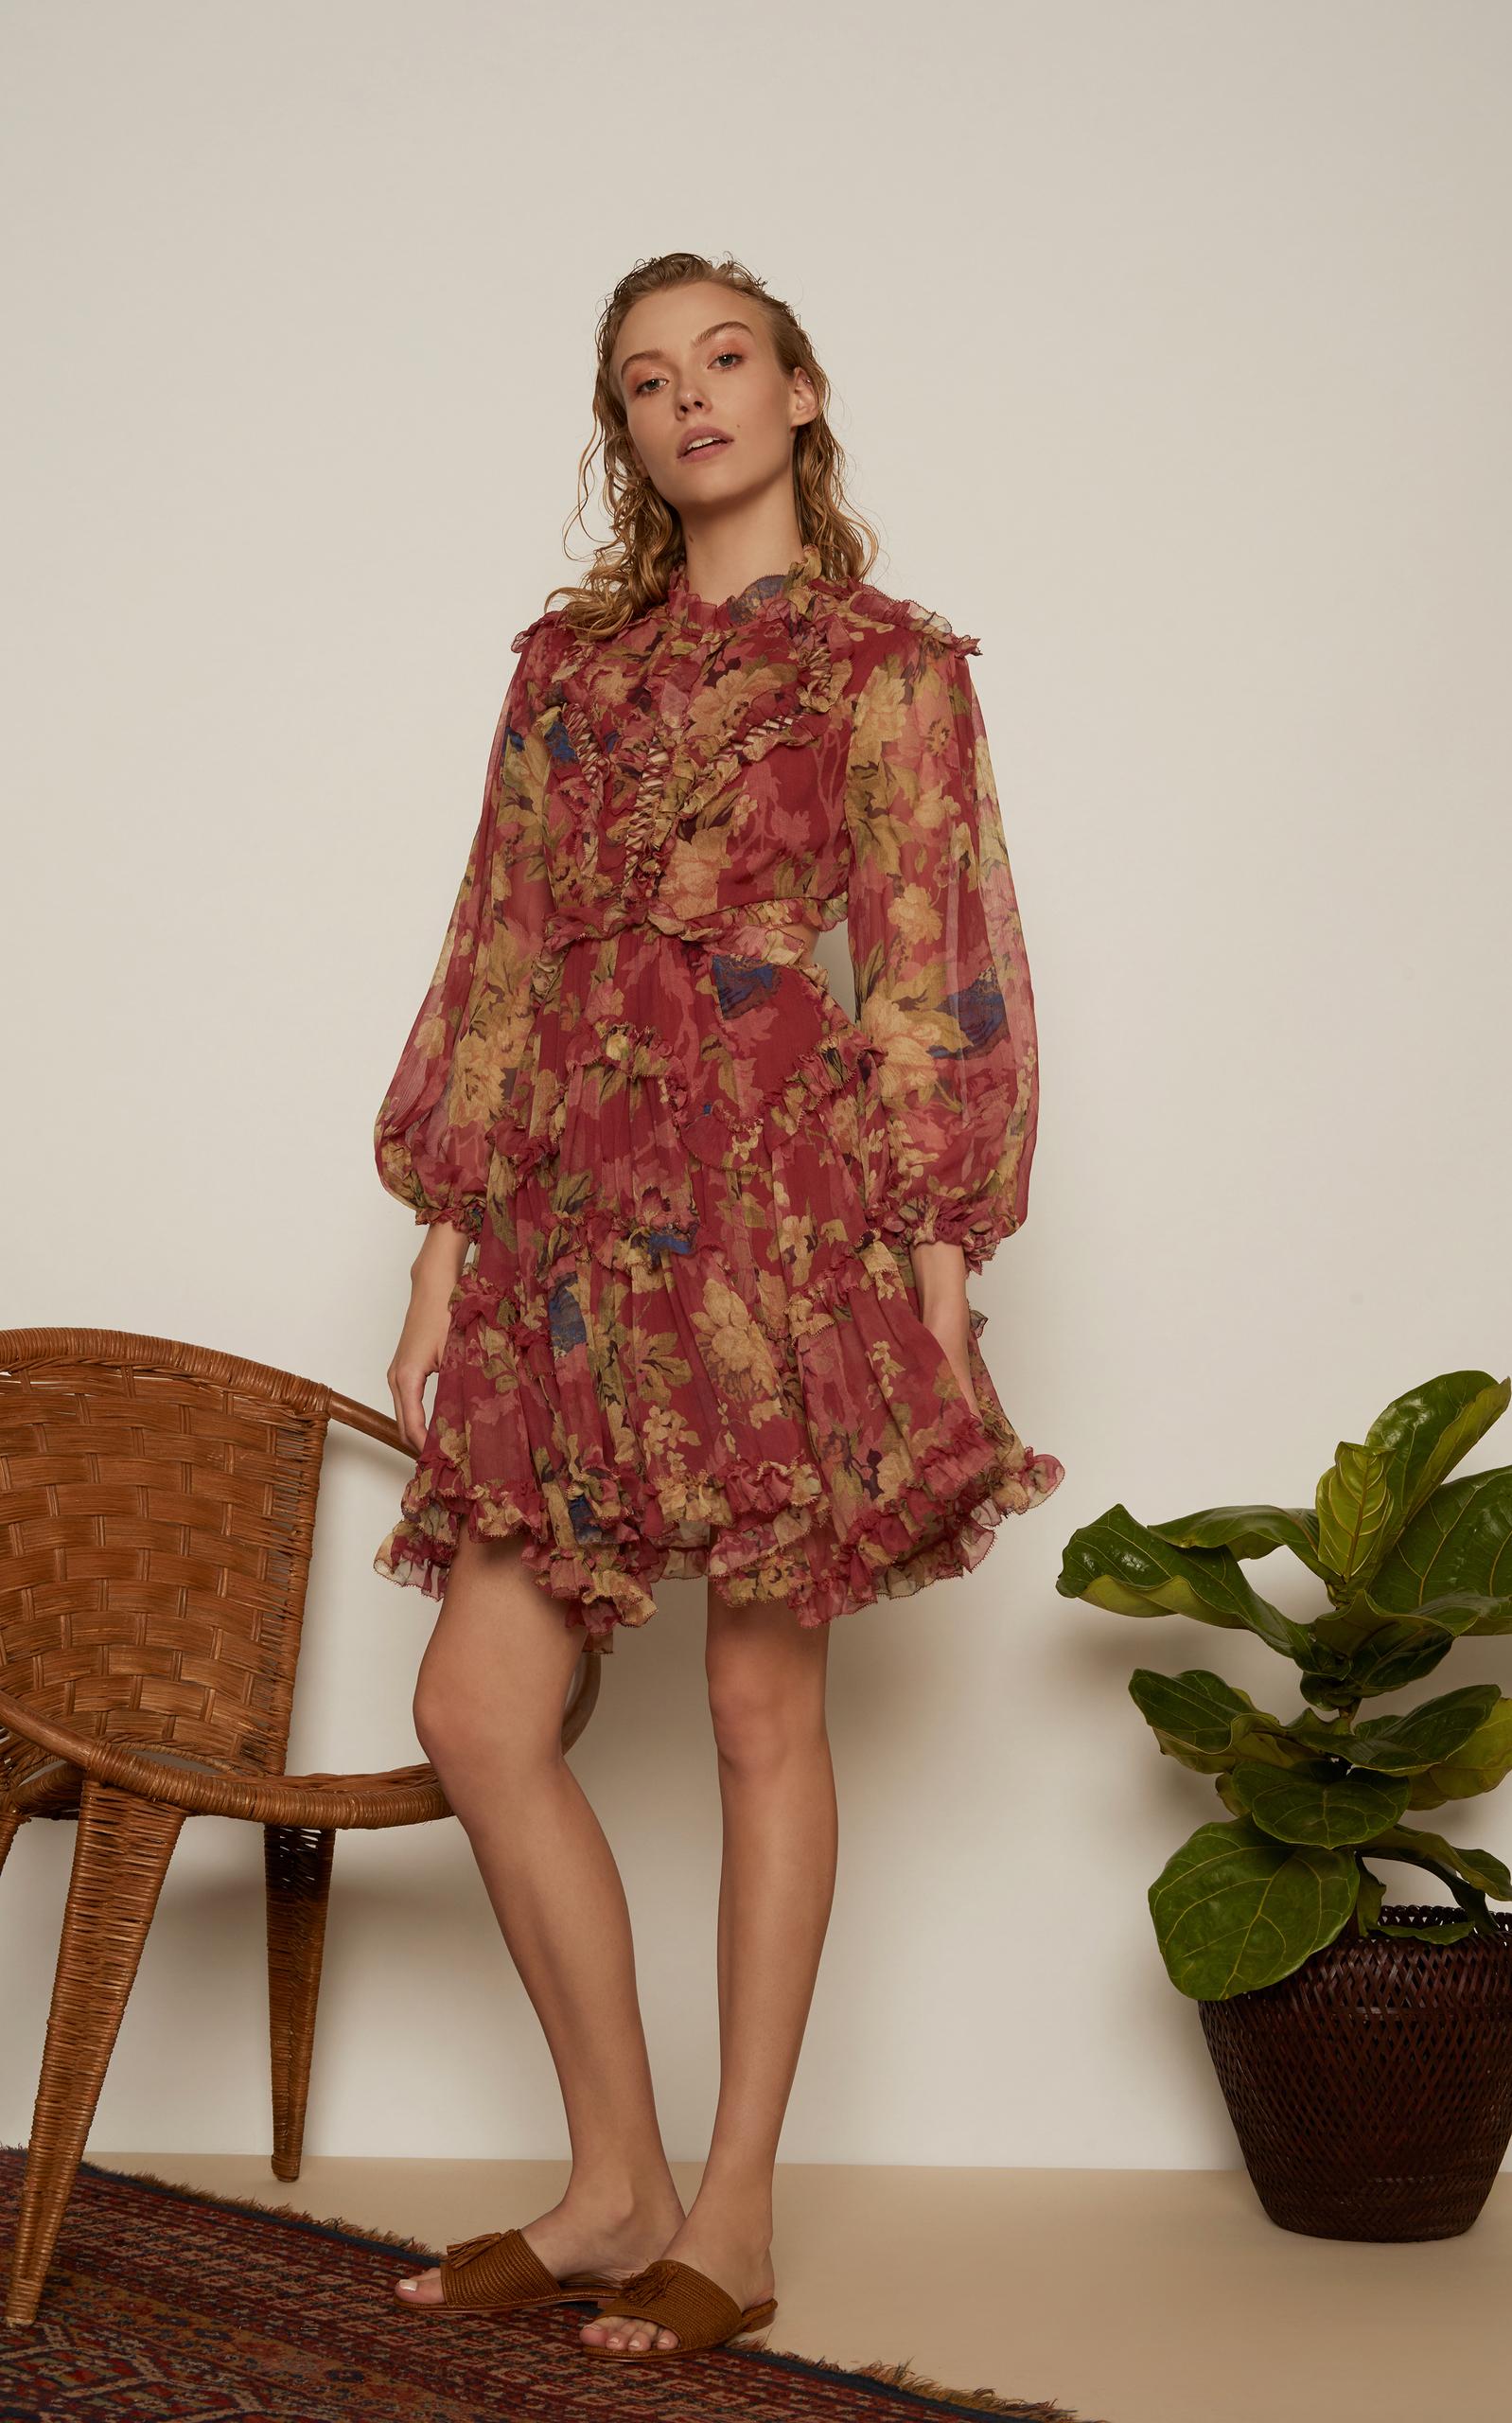 d1e91d6443220 Melody Lace Up Mini Dress by Zimmermann | Moda Operandi